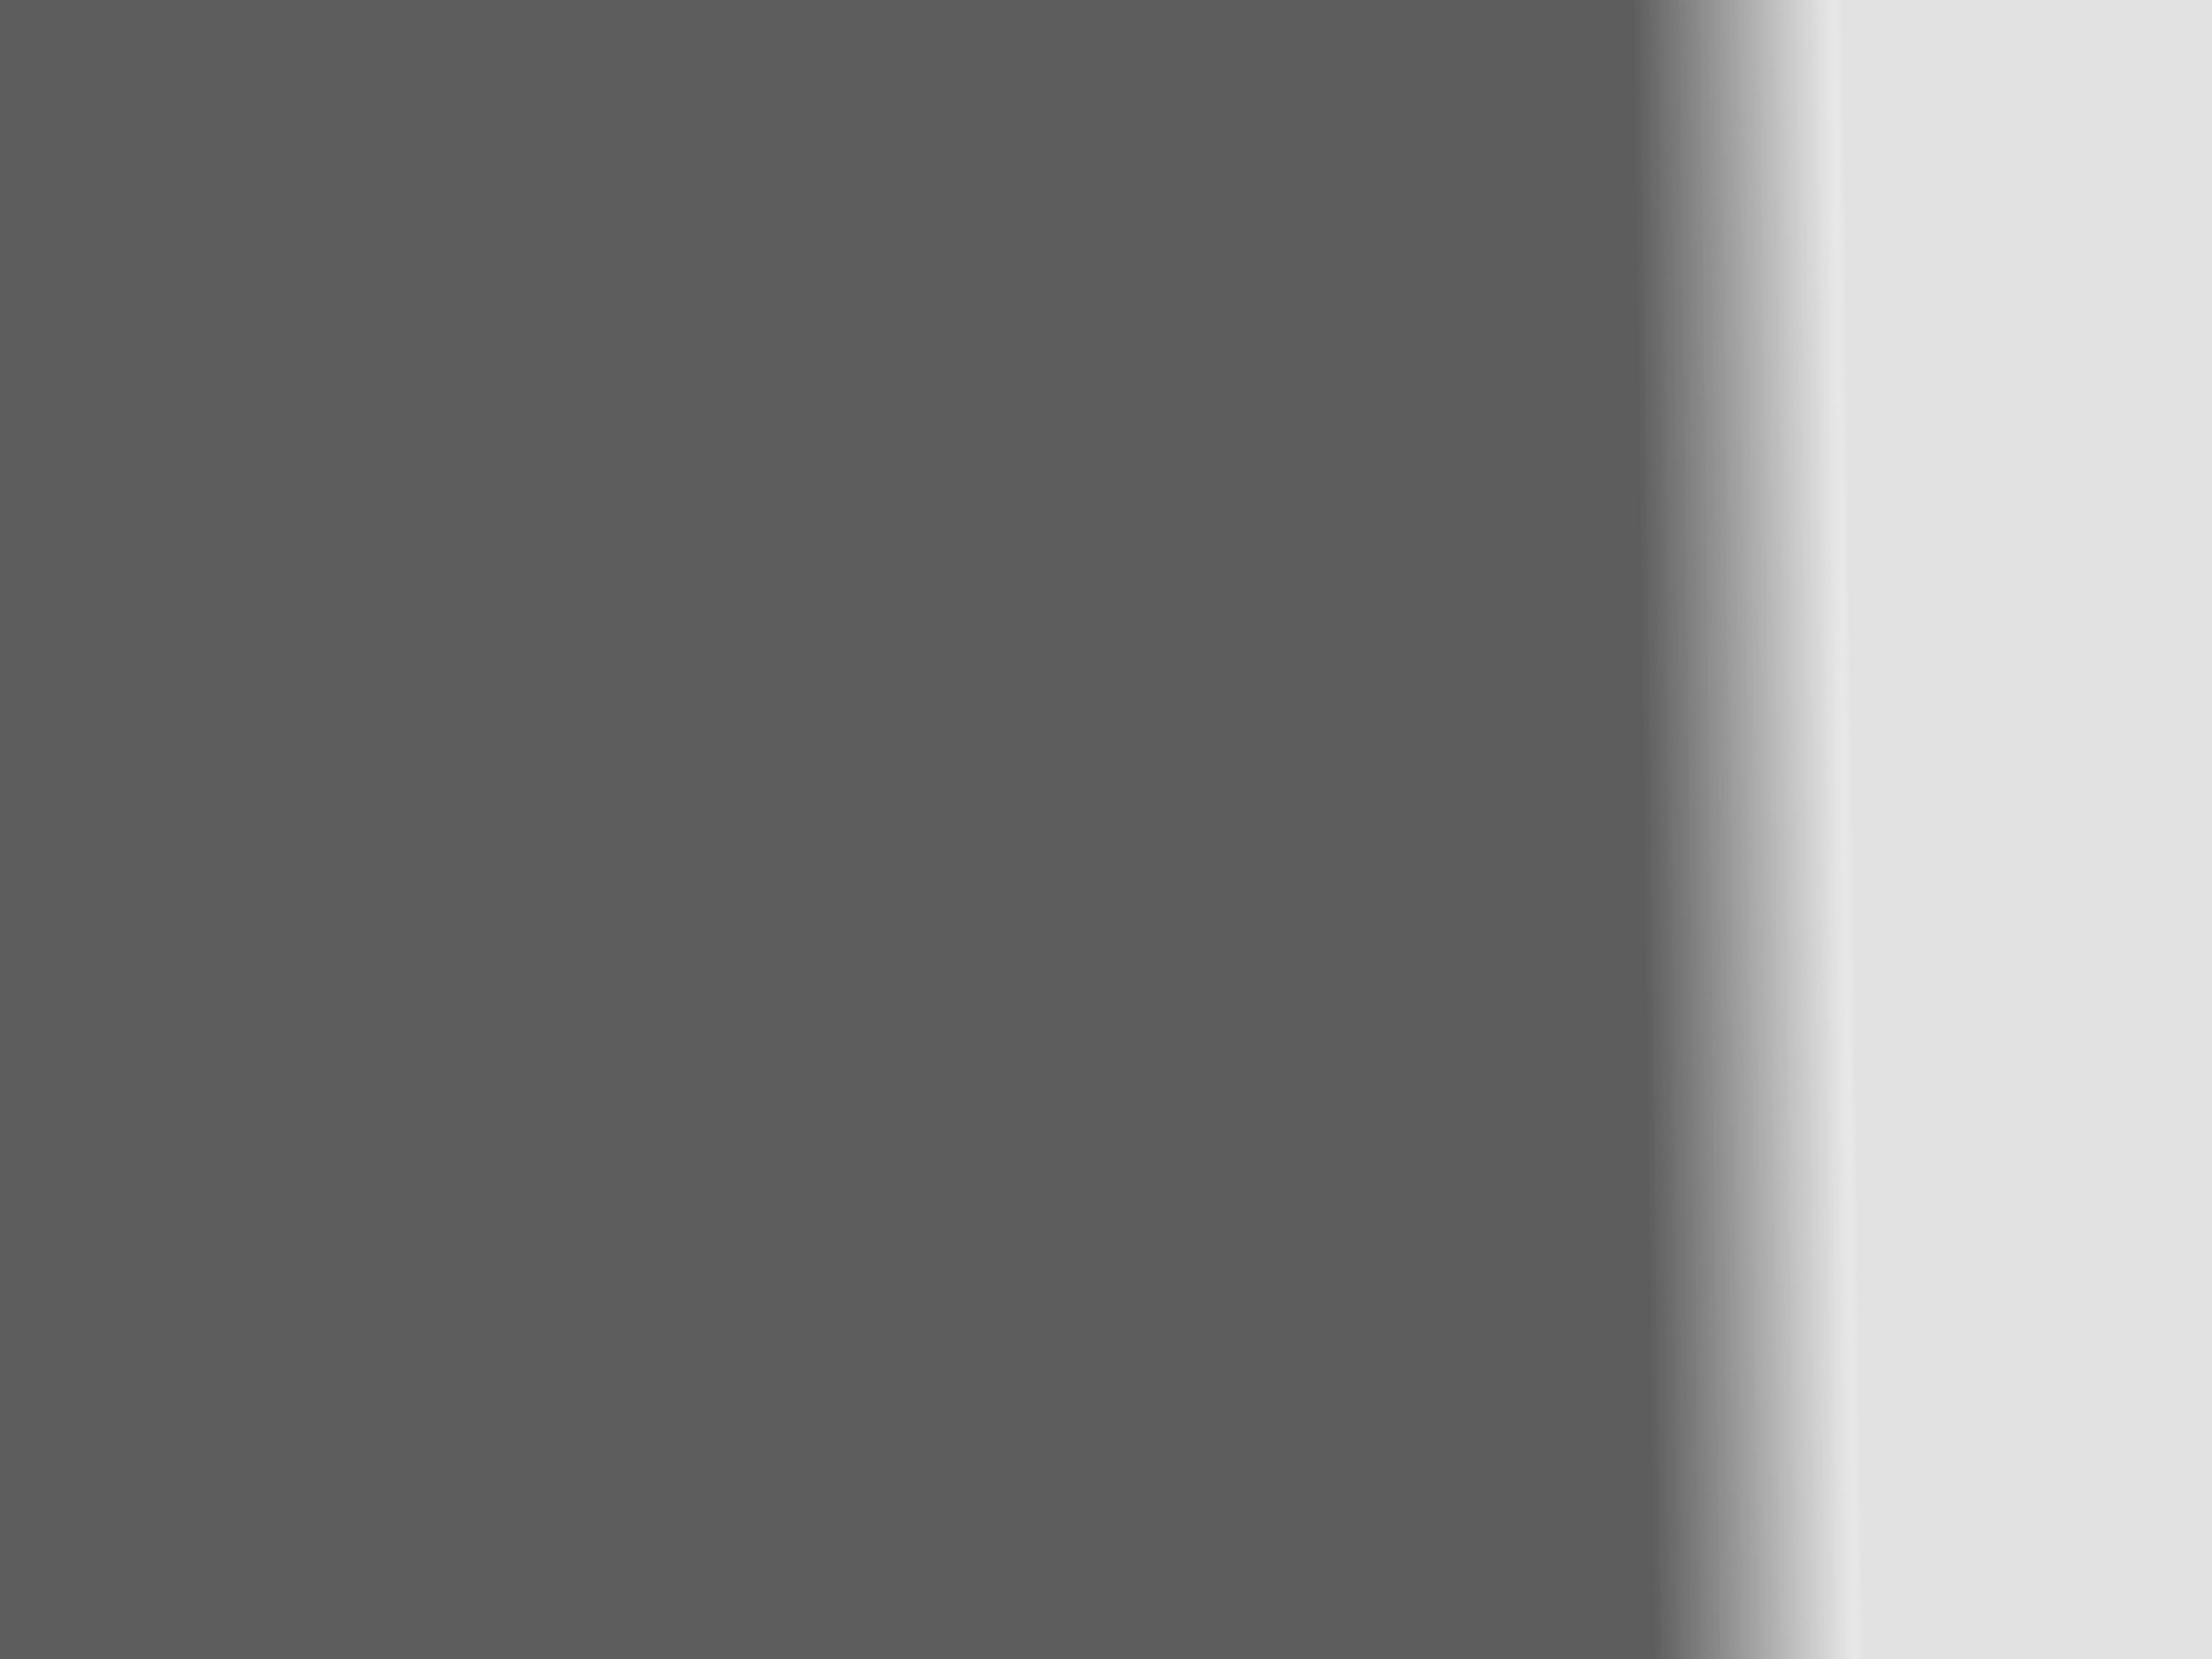 grisblanco